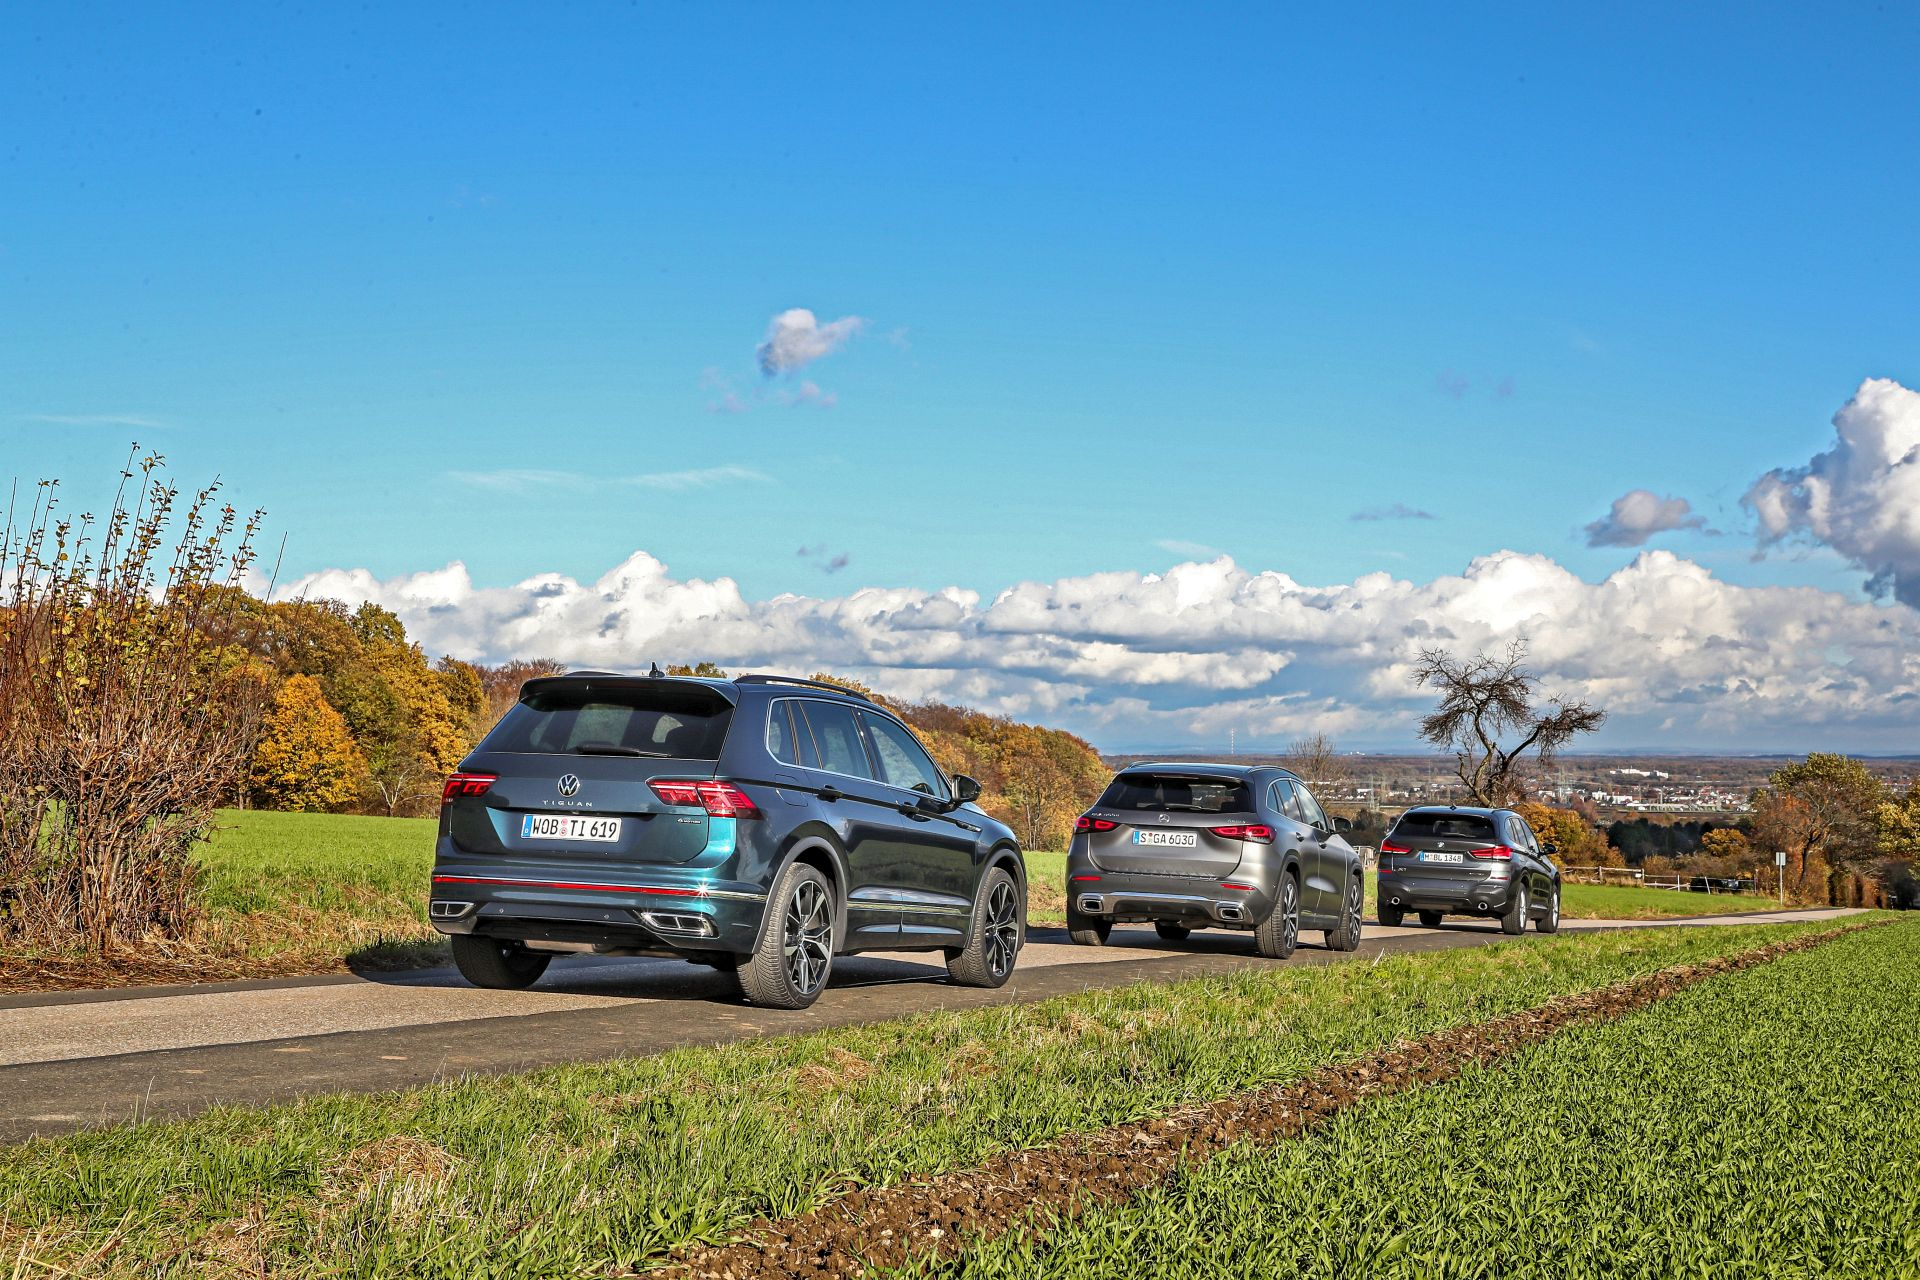 Mercedes_GLA_VW_Tiguan_BMX_X1_1120_Gotta_19